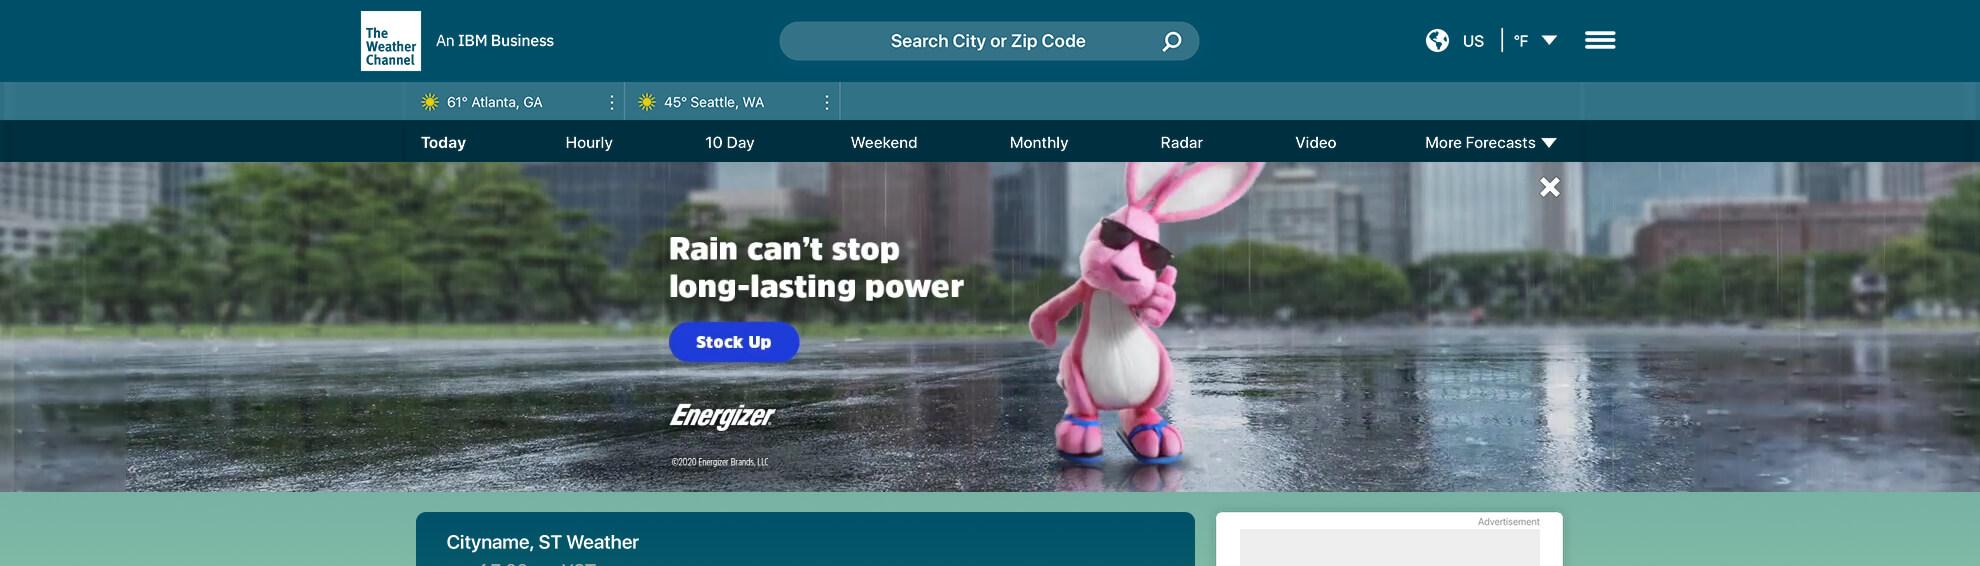 energizer-lwim-rainy-day